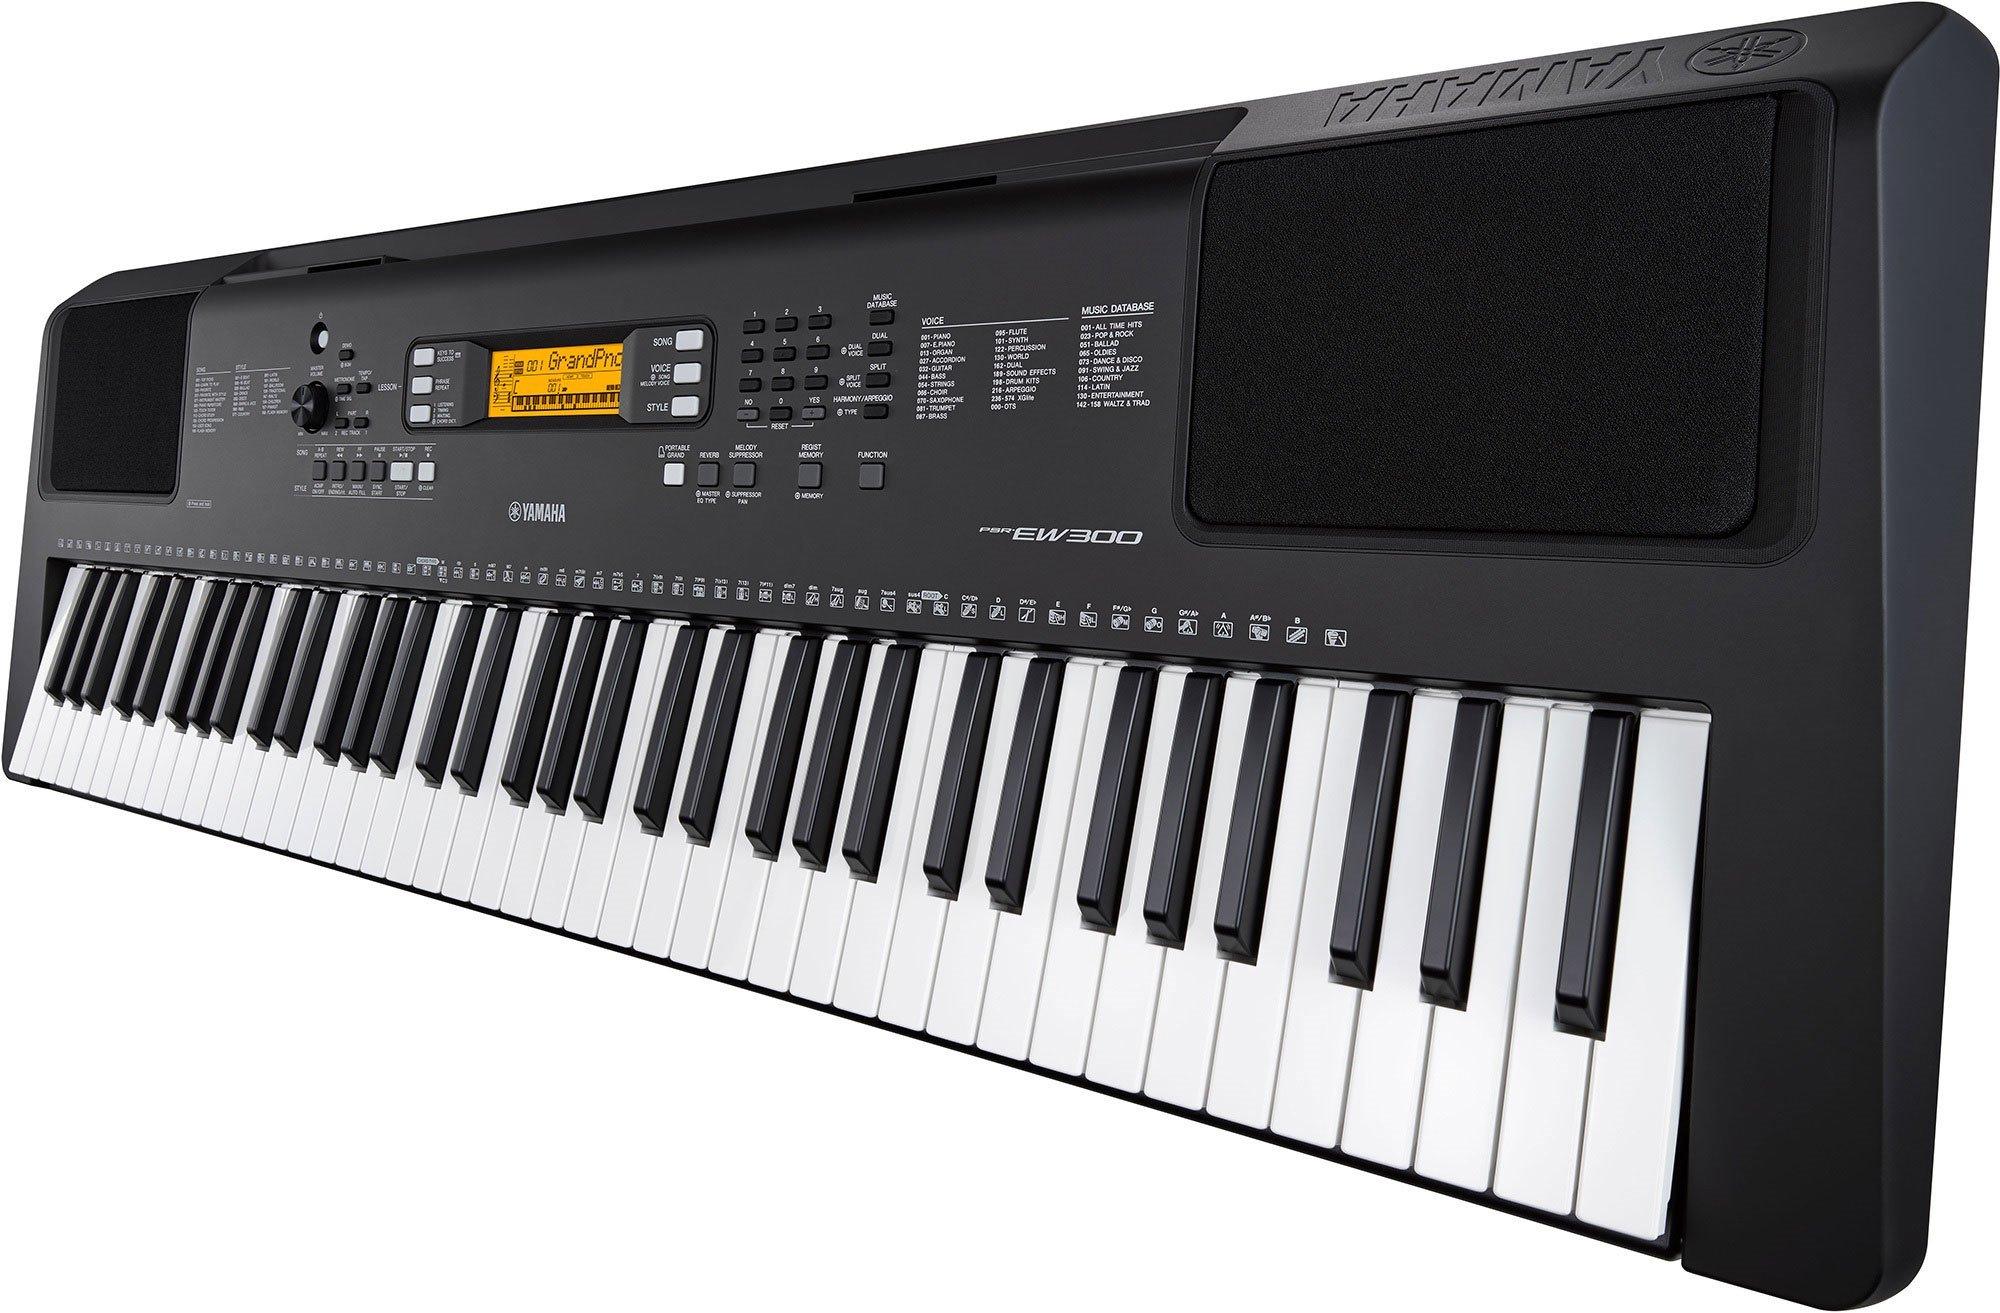 Yamaha PSR-EW300 76-Key Portable Keyboard (power adapter sold separately) by YAMAHA (Image #3)